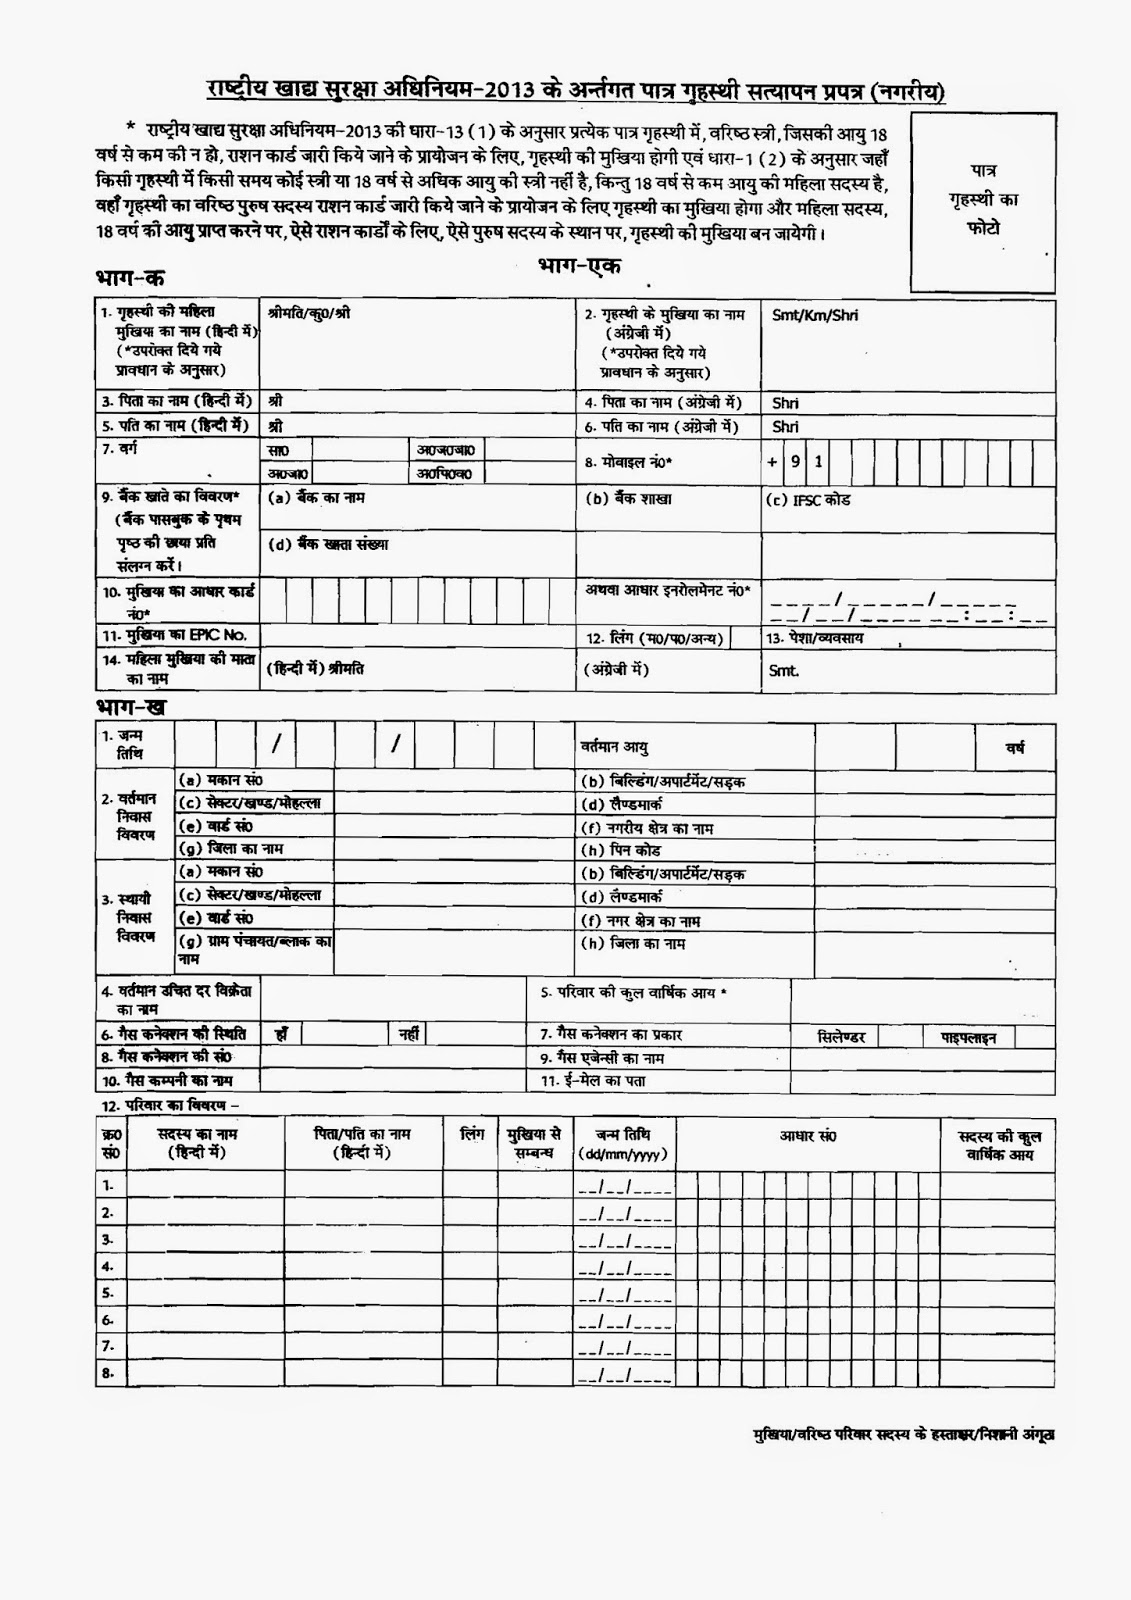 Ration Card Up Form Pdf T Score Table For Ecbi